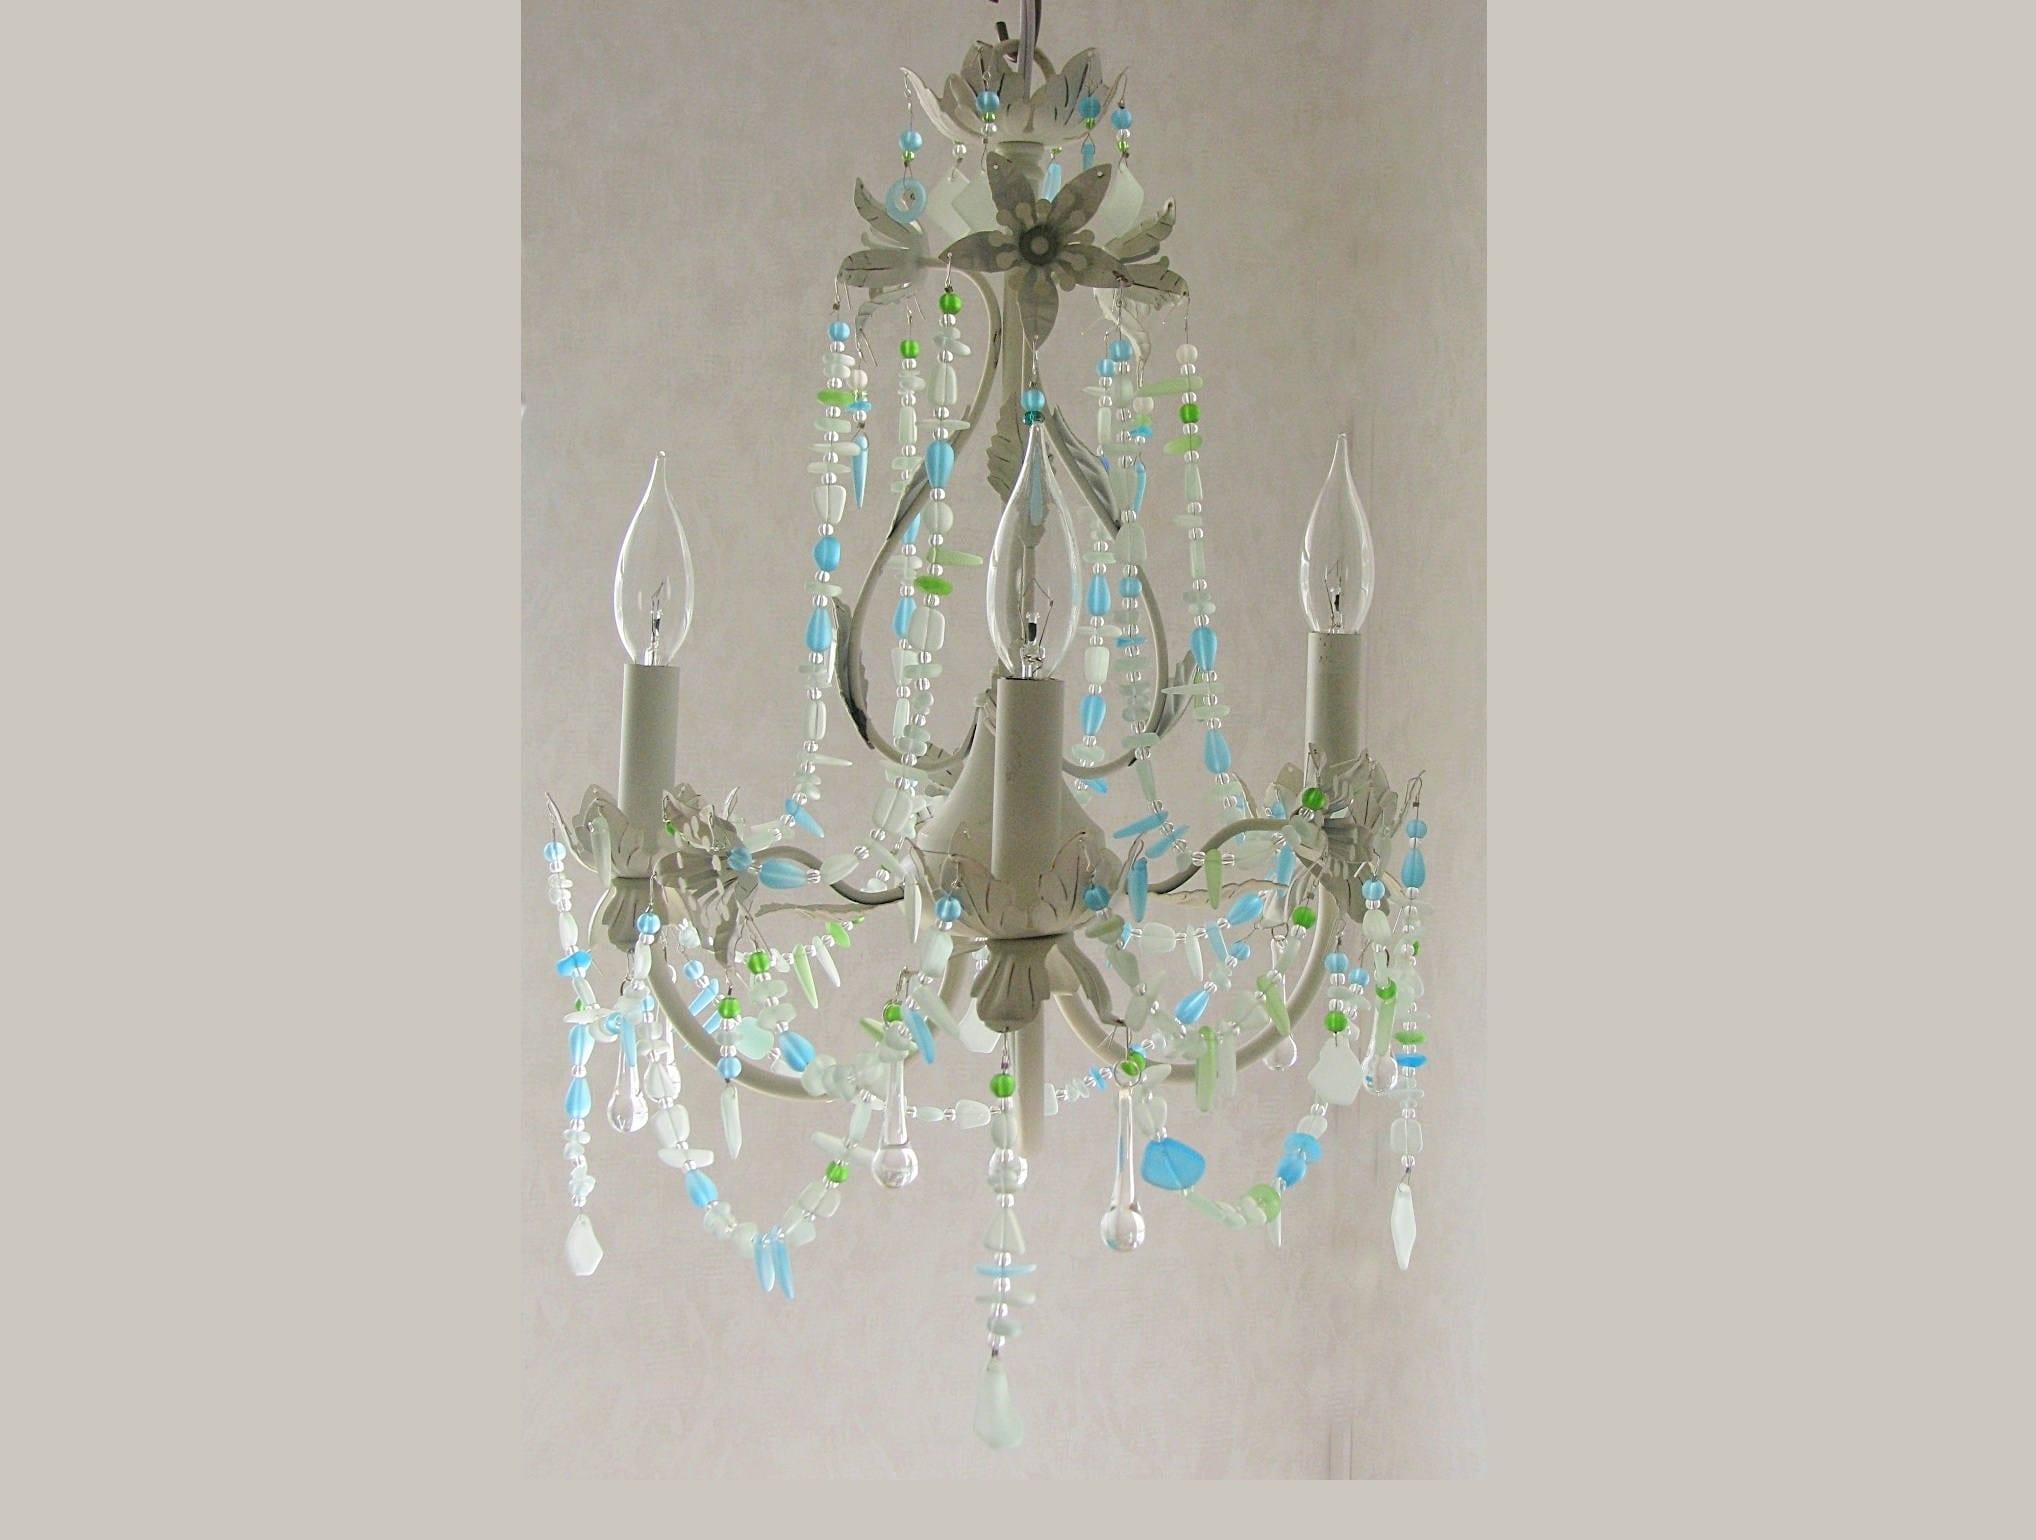 Sea glass lighting fixture chandelier beach cottage shabby chic coastal decor beach glass crystal chandelier tole light fixture floral light